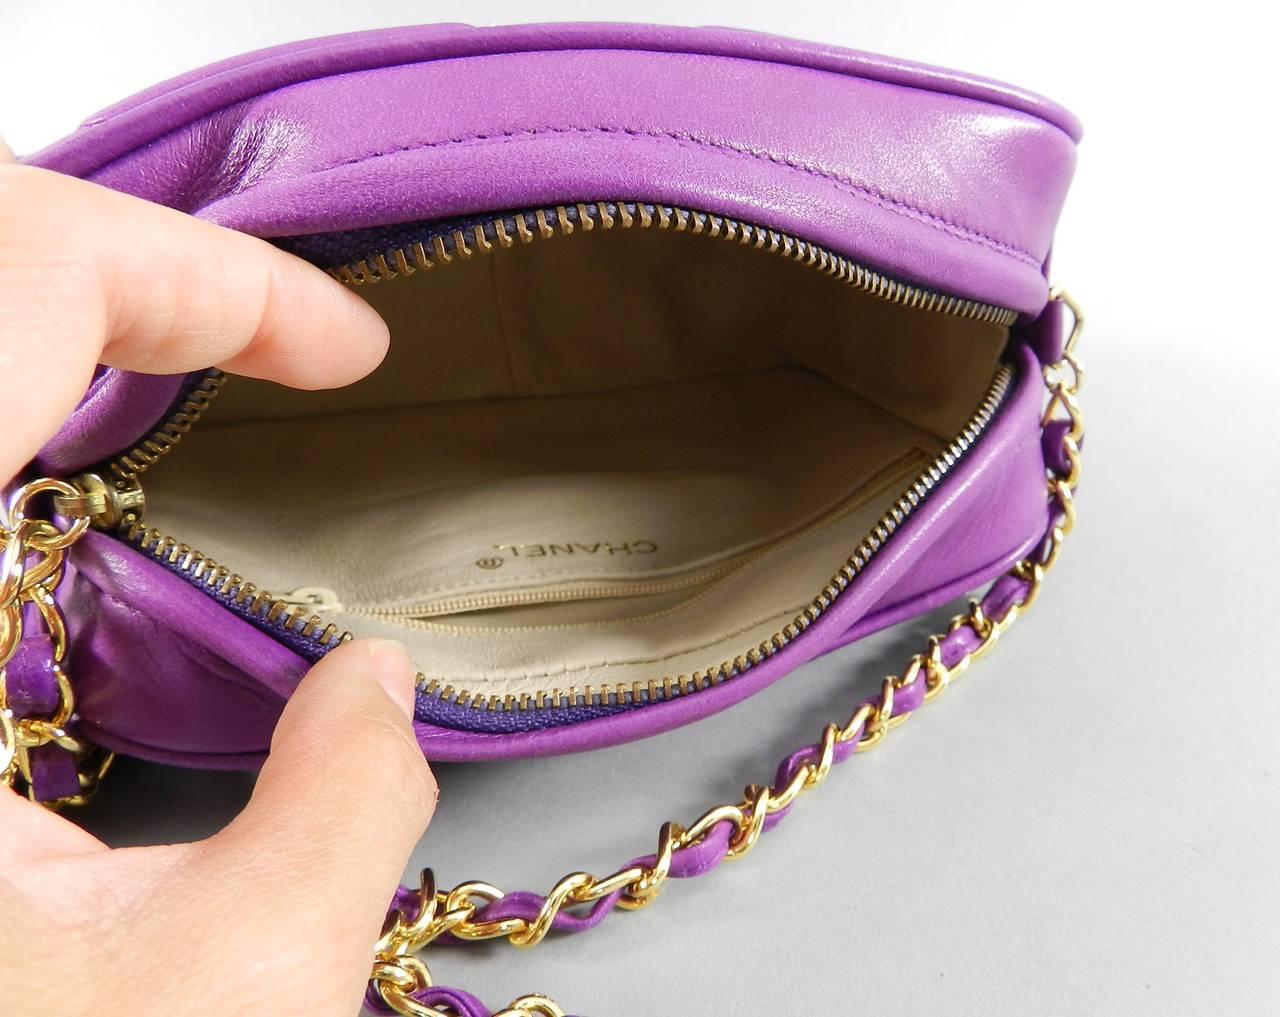 6aab5385 Chanel Vintage 1986 Purple Leather Crossbody CC Chain Bag